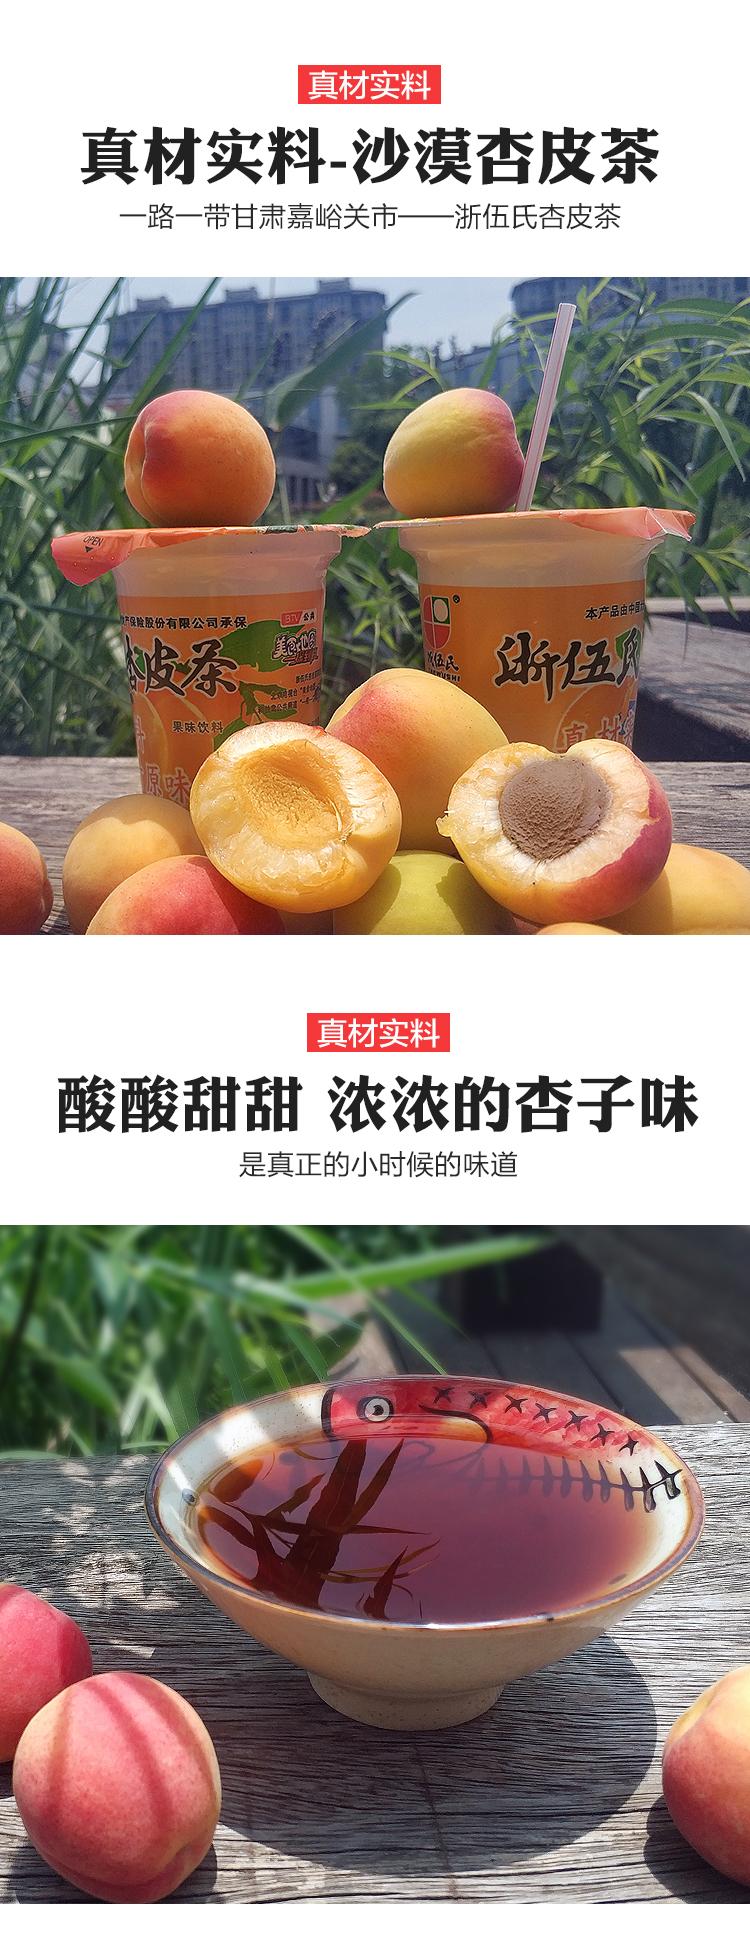 ope官方体育氏杏皮水11.jpg